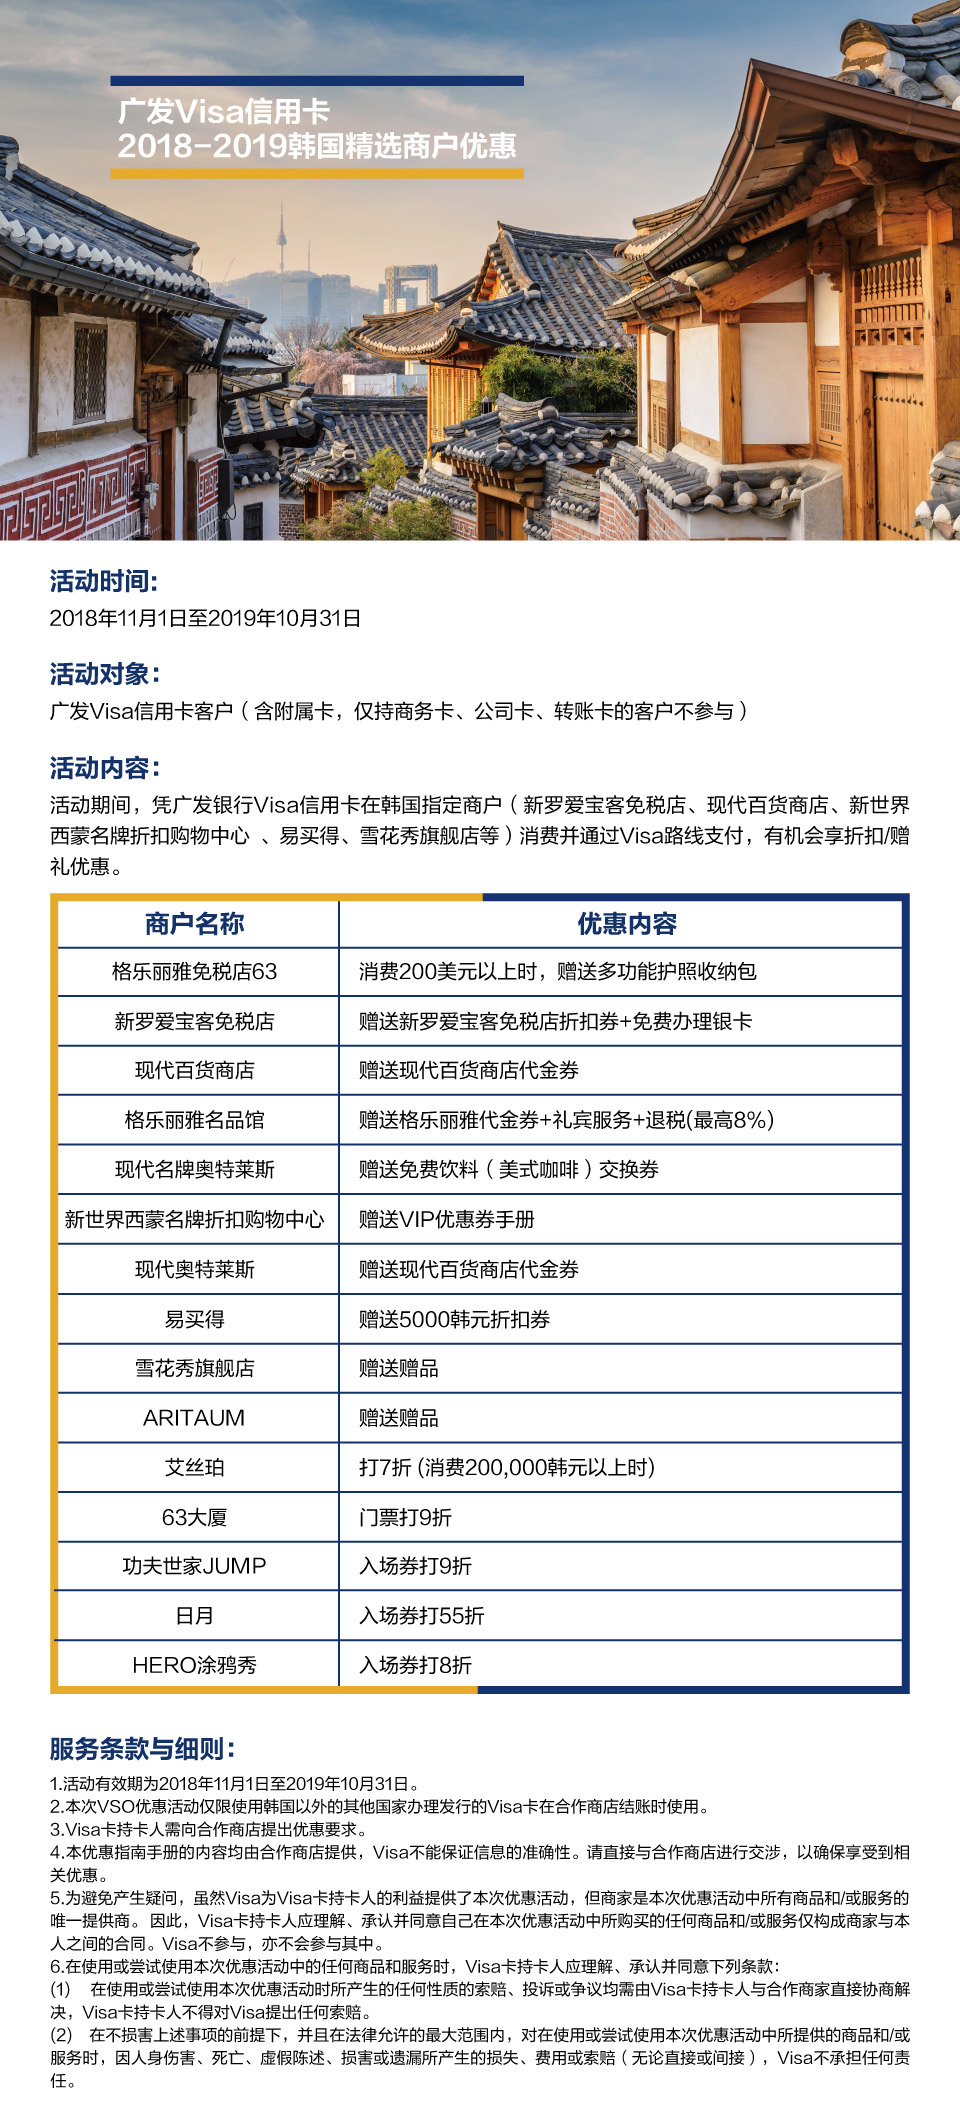 Visa 2018-2019韩国精选商户